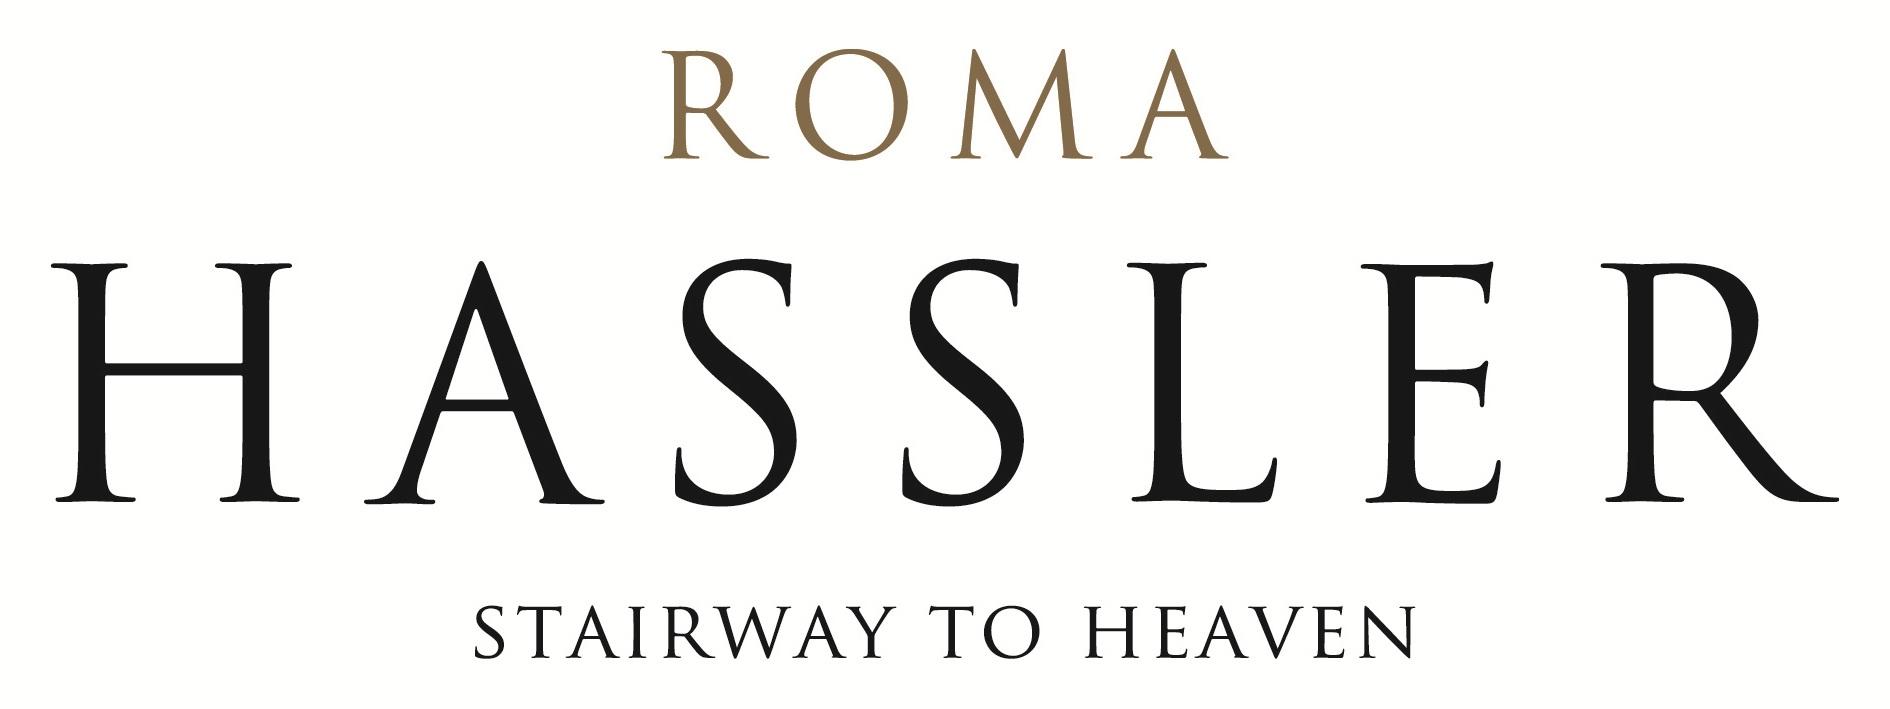 Hassler New logo 2015 .2